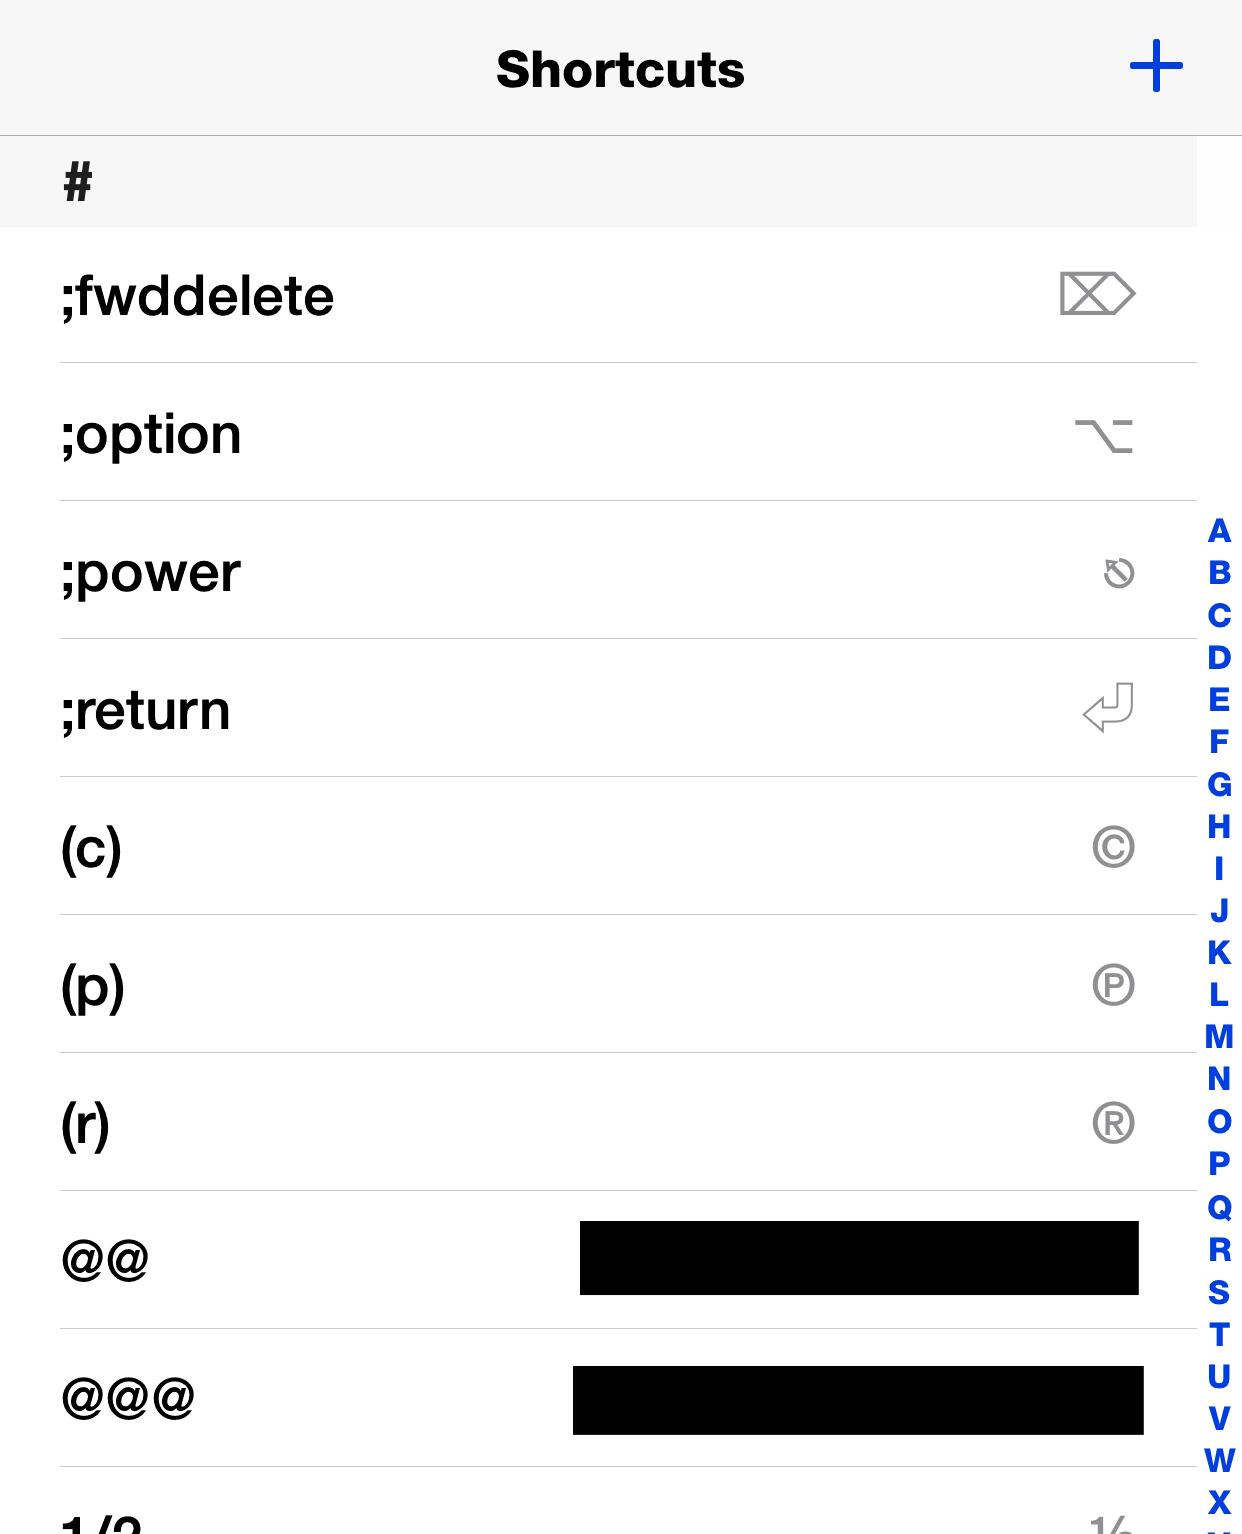 ios text shortcuts dan frakes danfrakes com  at alyssarenee.co